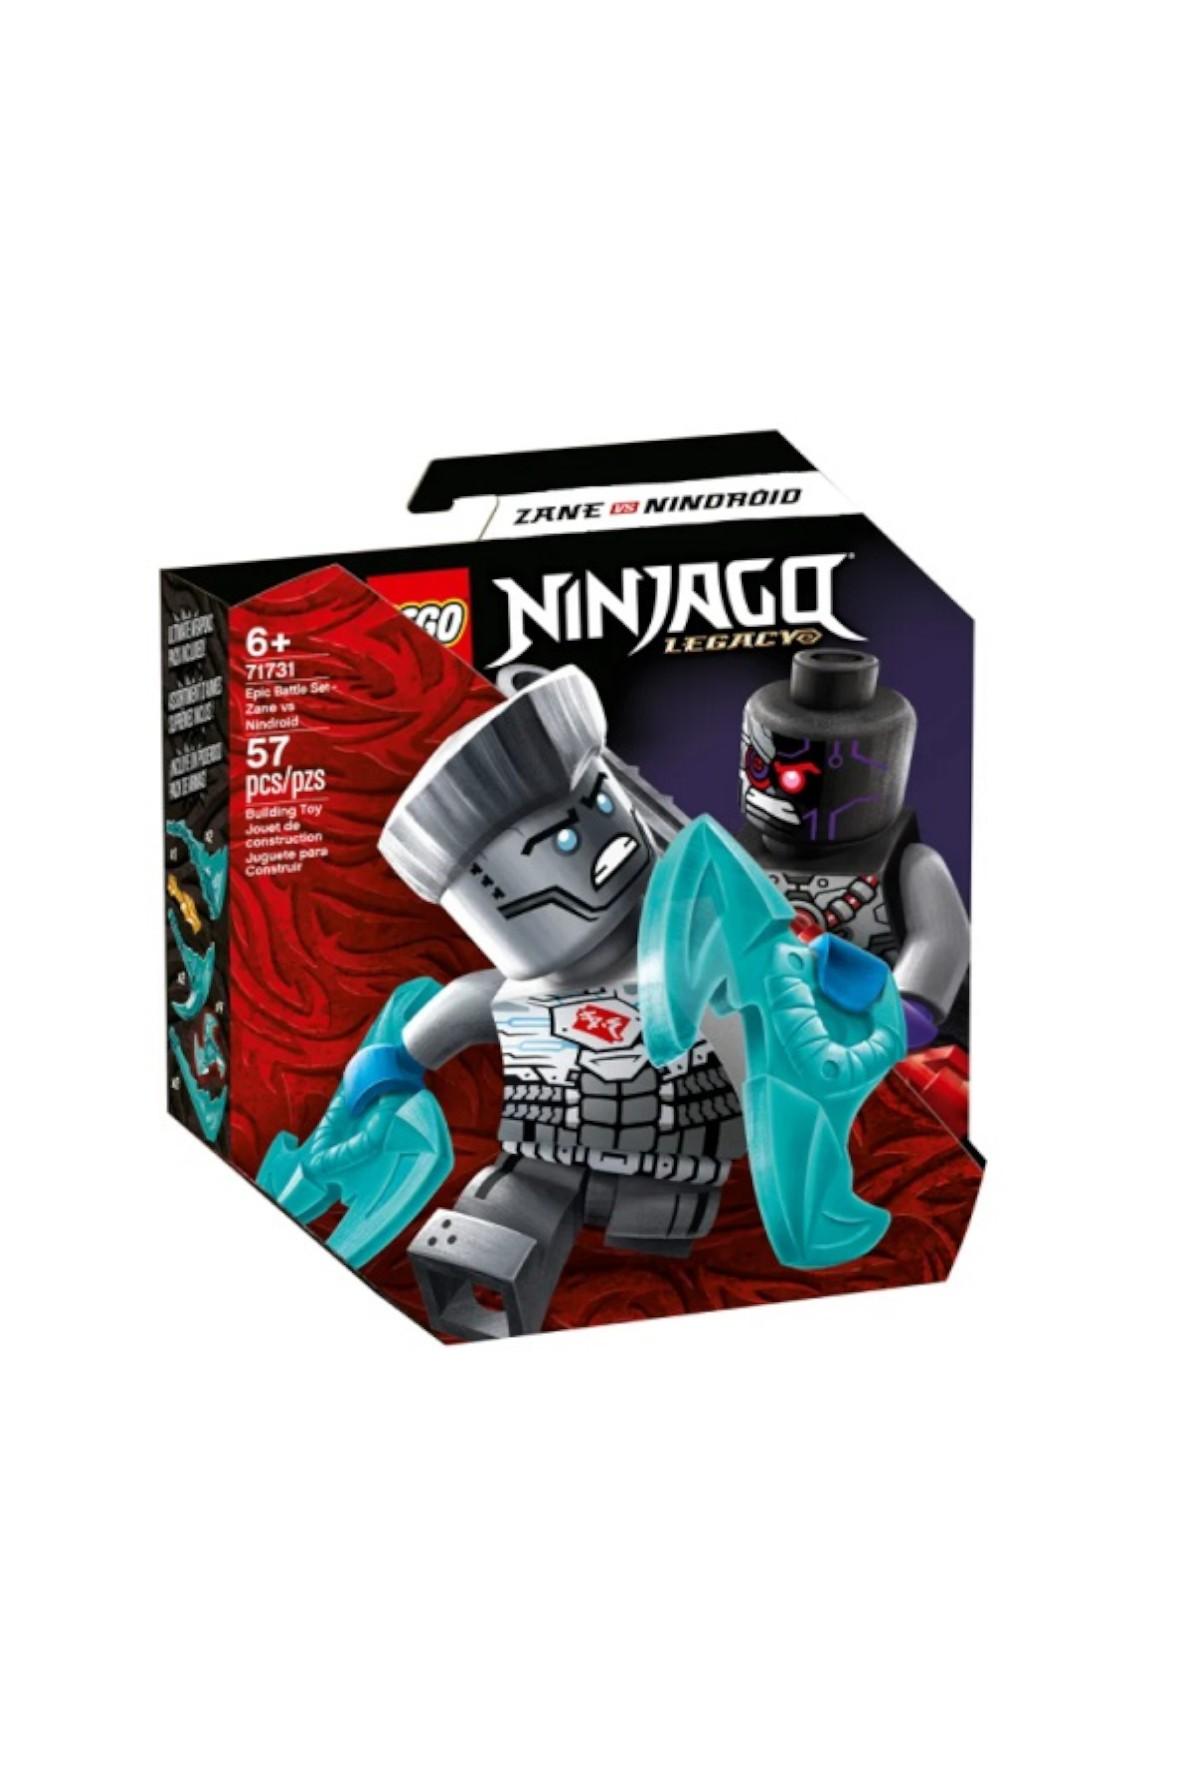 LEGO Ninjago - Epicki zestaw bojowy - Zane kontra Nindroid - 57 el